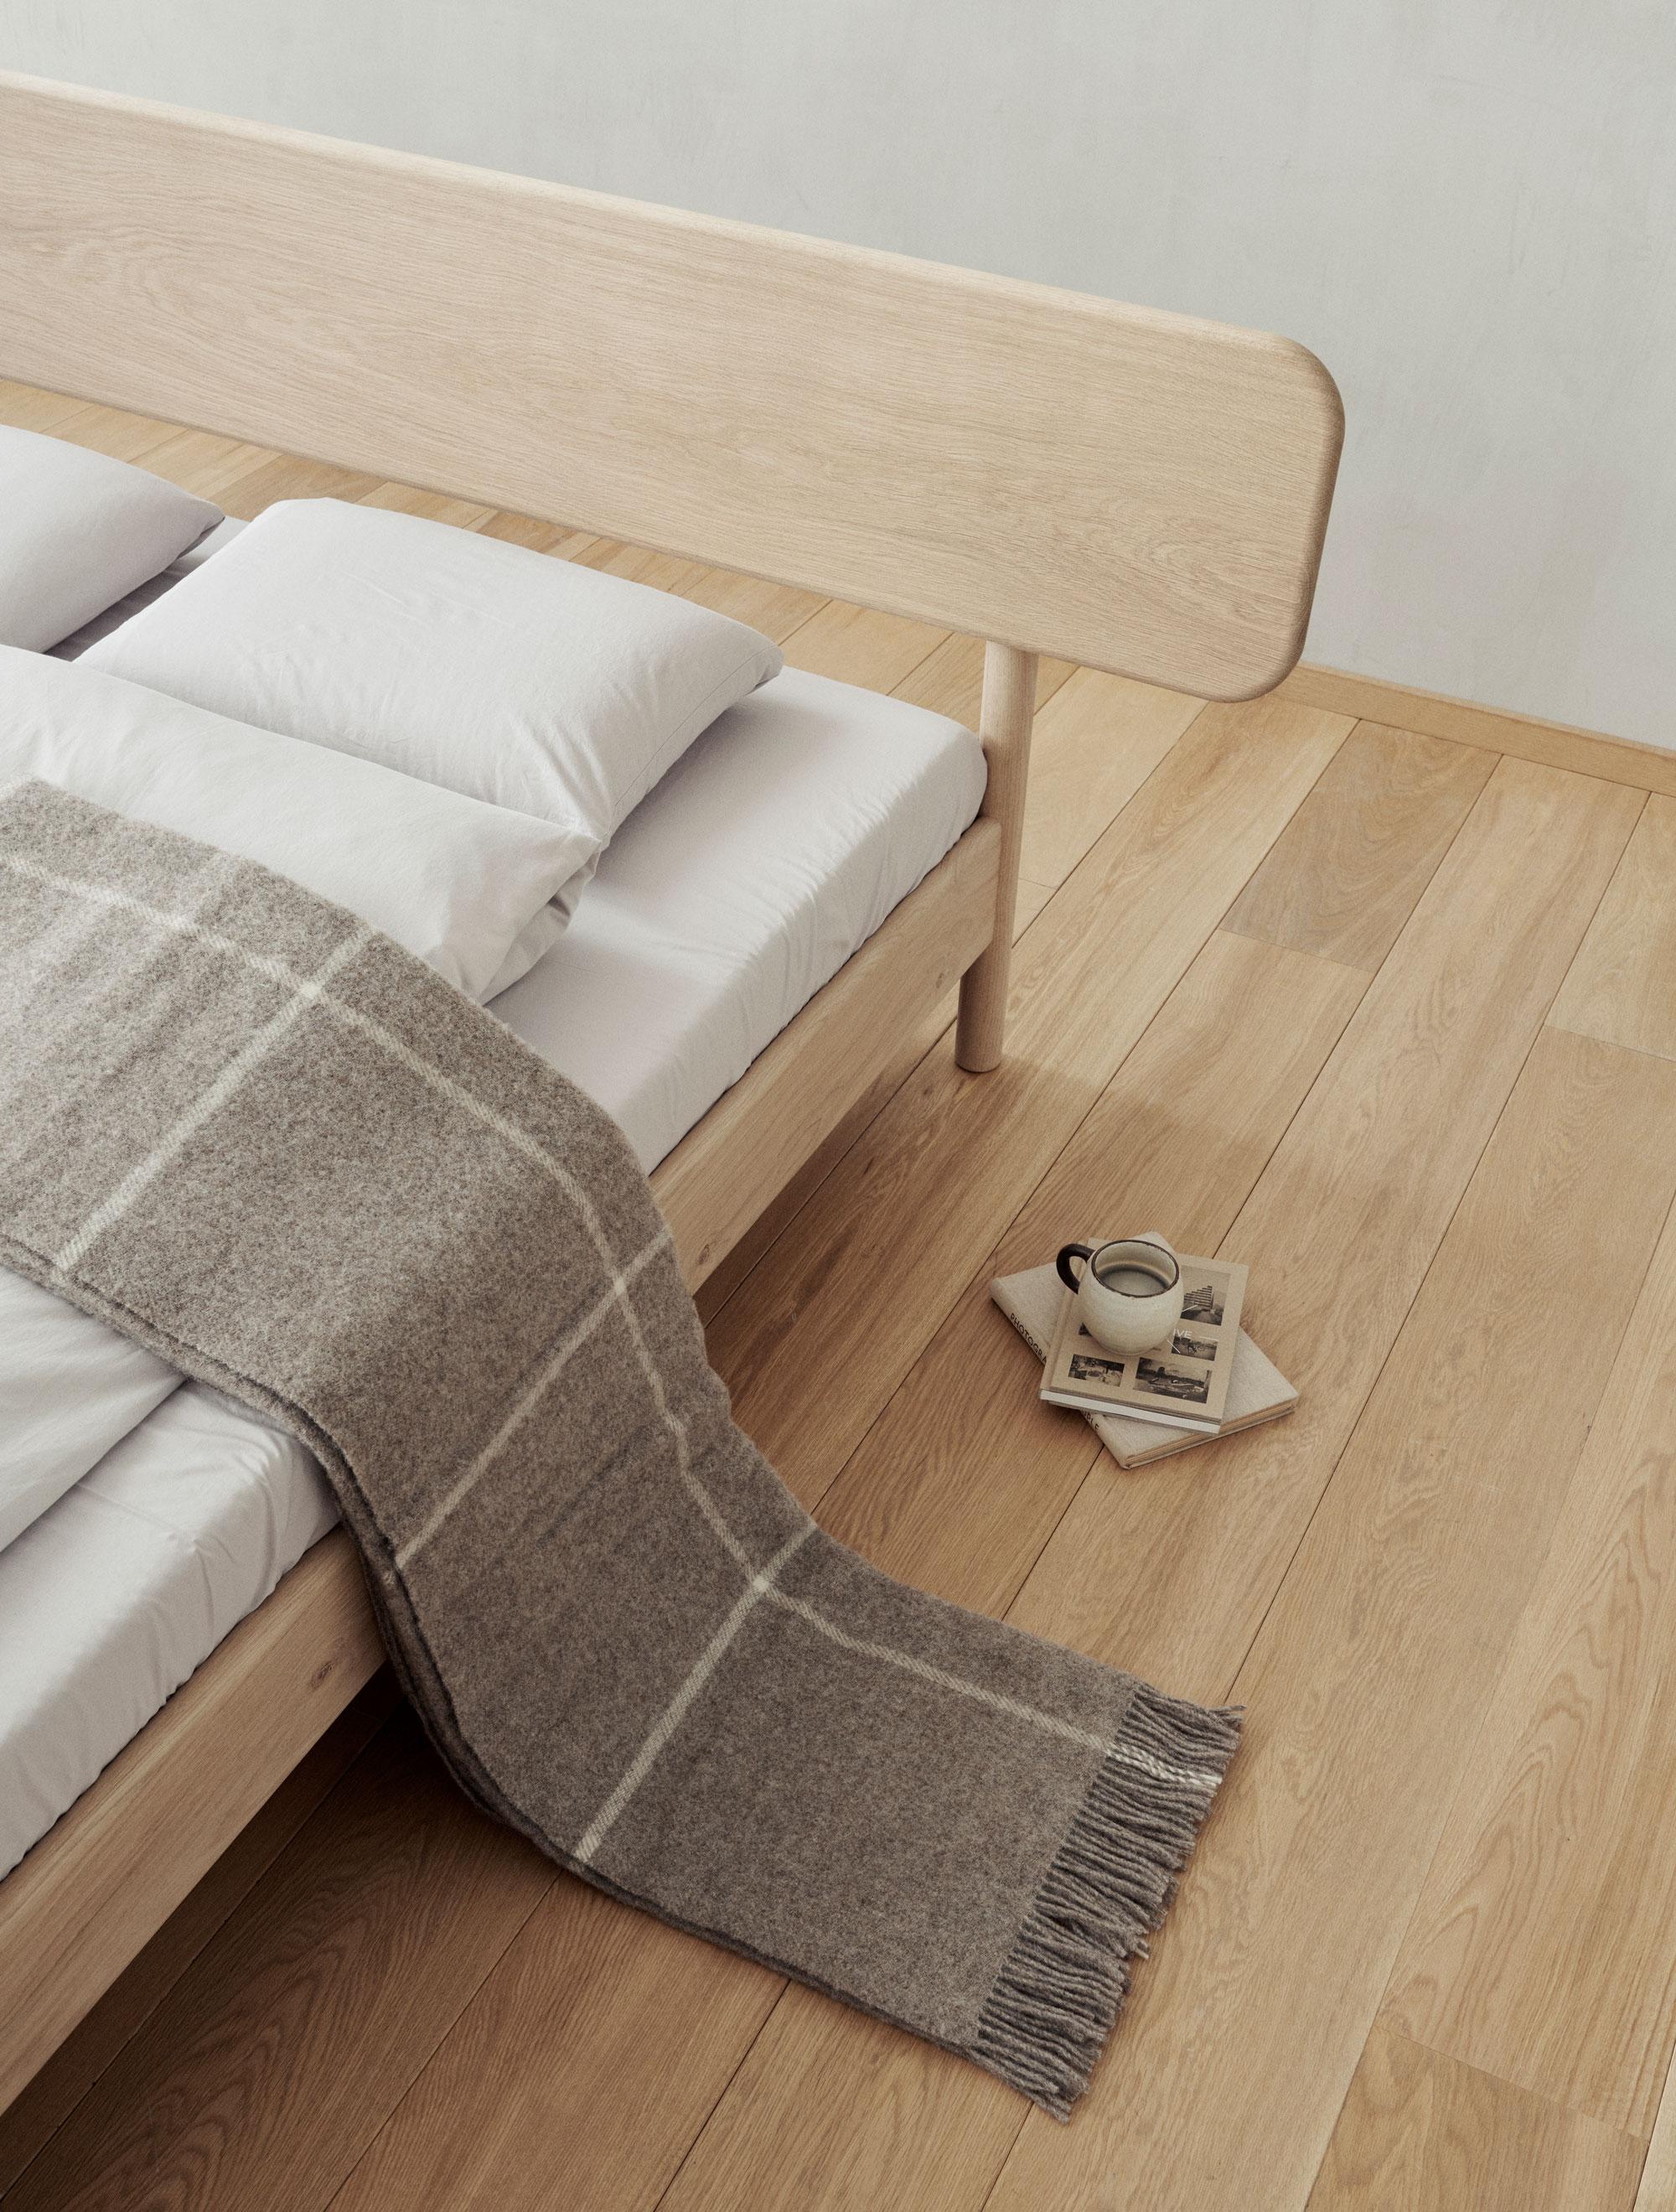 04---ALKEN-BED-AT-THE-LAB---RE-BEDS---DESIGN-BY-OLIVER-&-LUKAS-WEISSKROGH.jpg